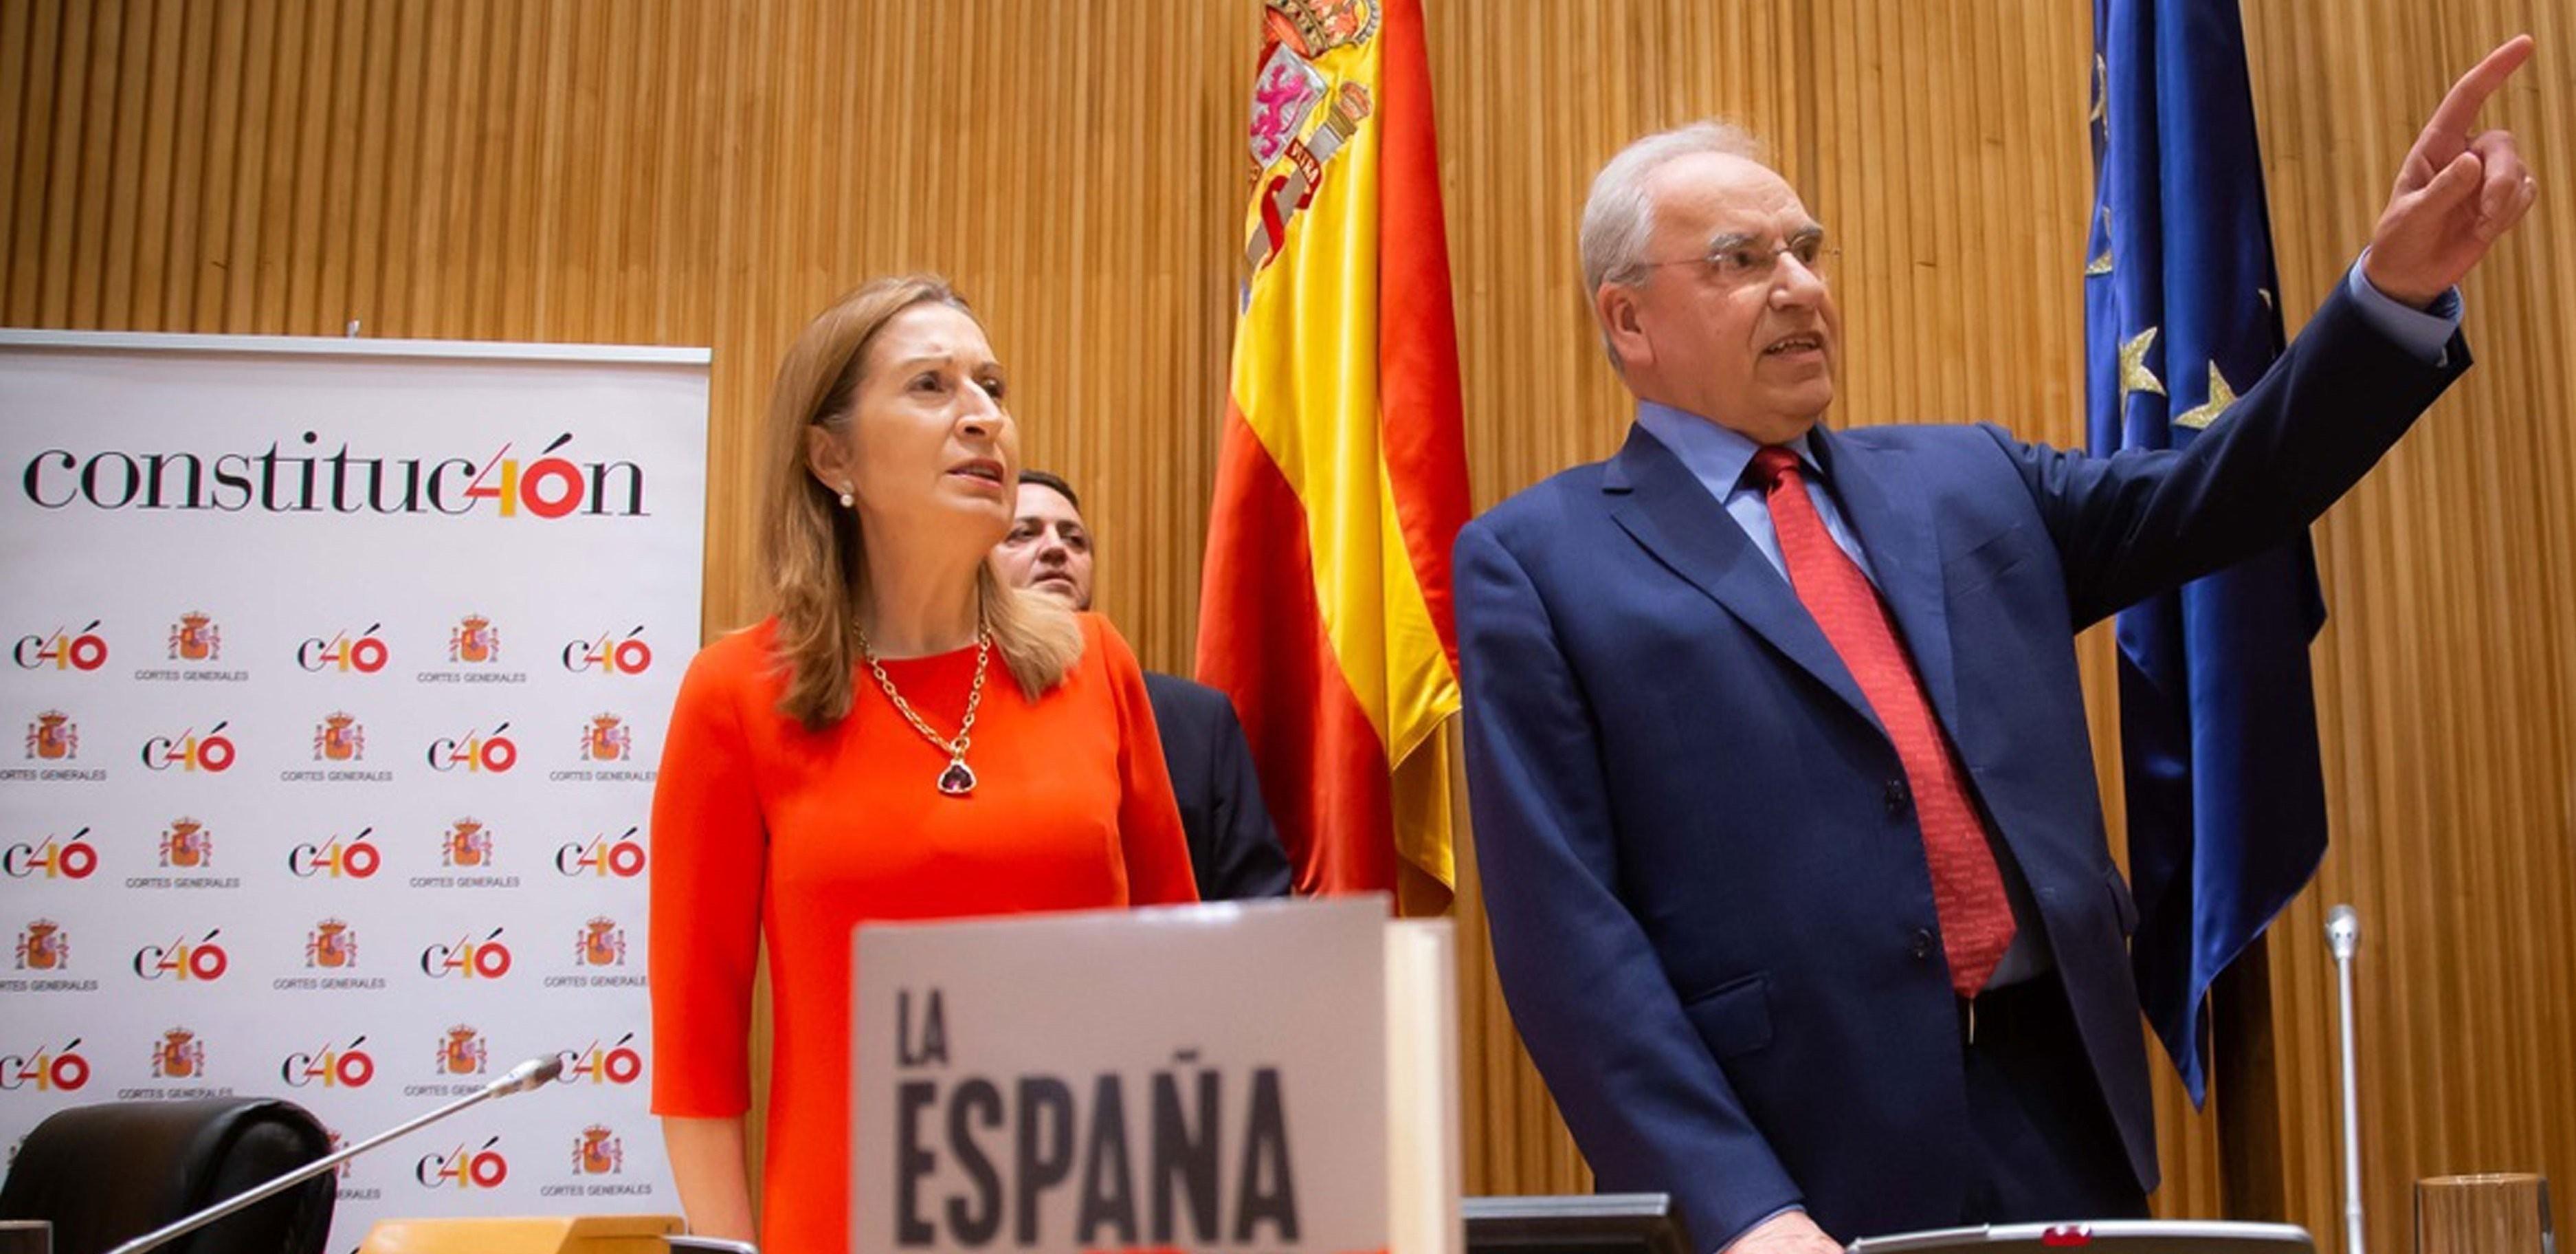 El ex diputado del PP más fan de Alfonso Guerra